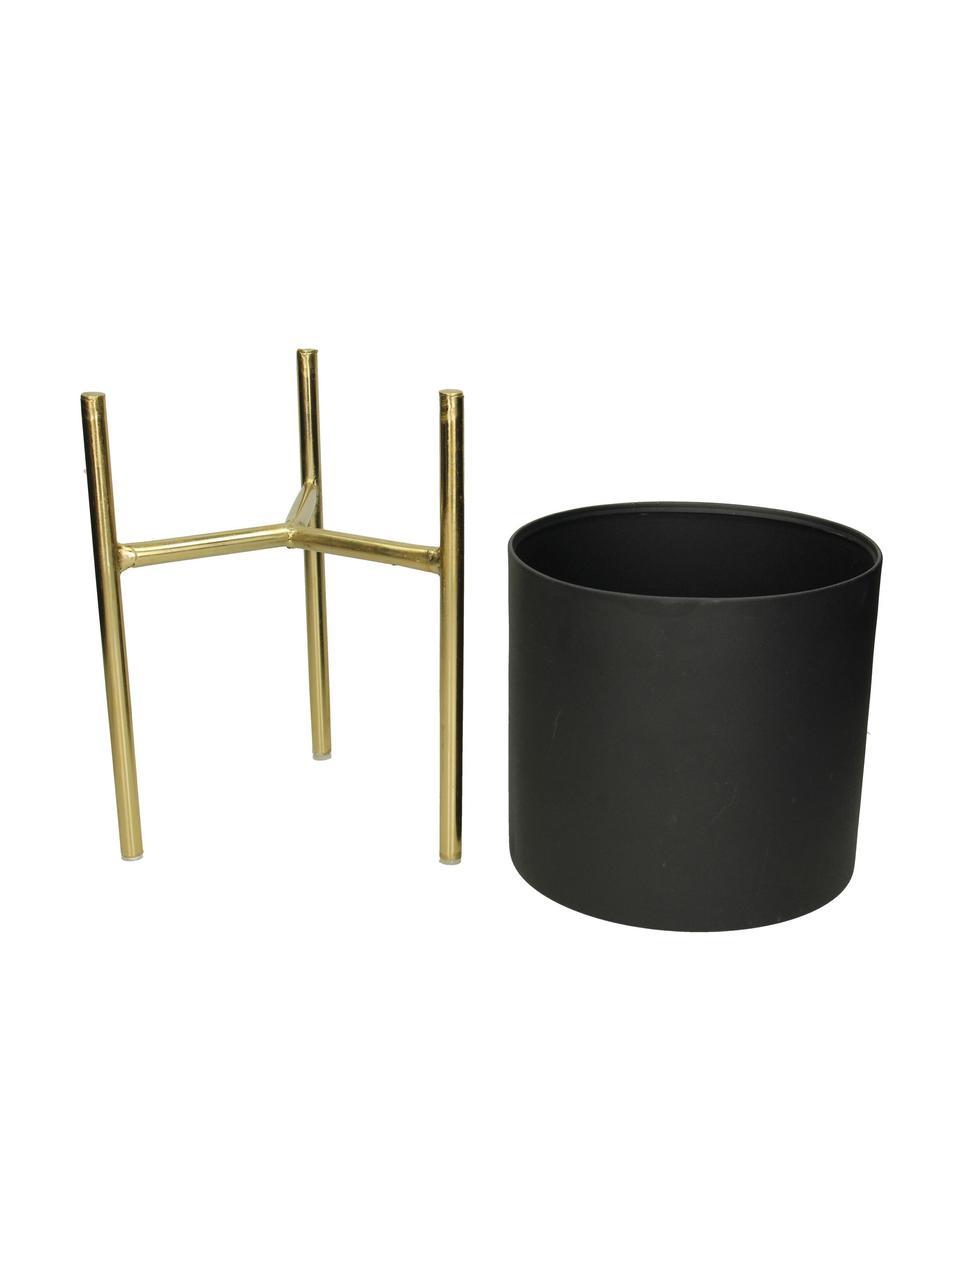 Set 3 portavasi rotondi in metallo Blako, Metallo rivestito, Nero, dorato, Set in varie misure